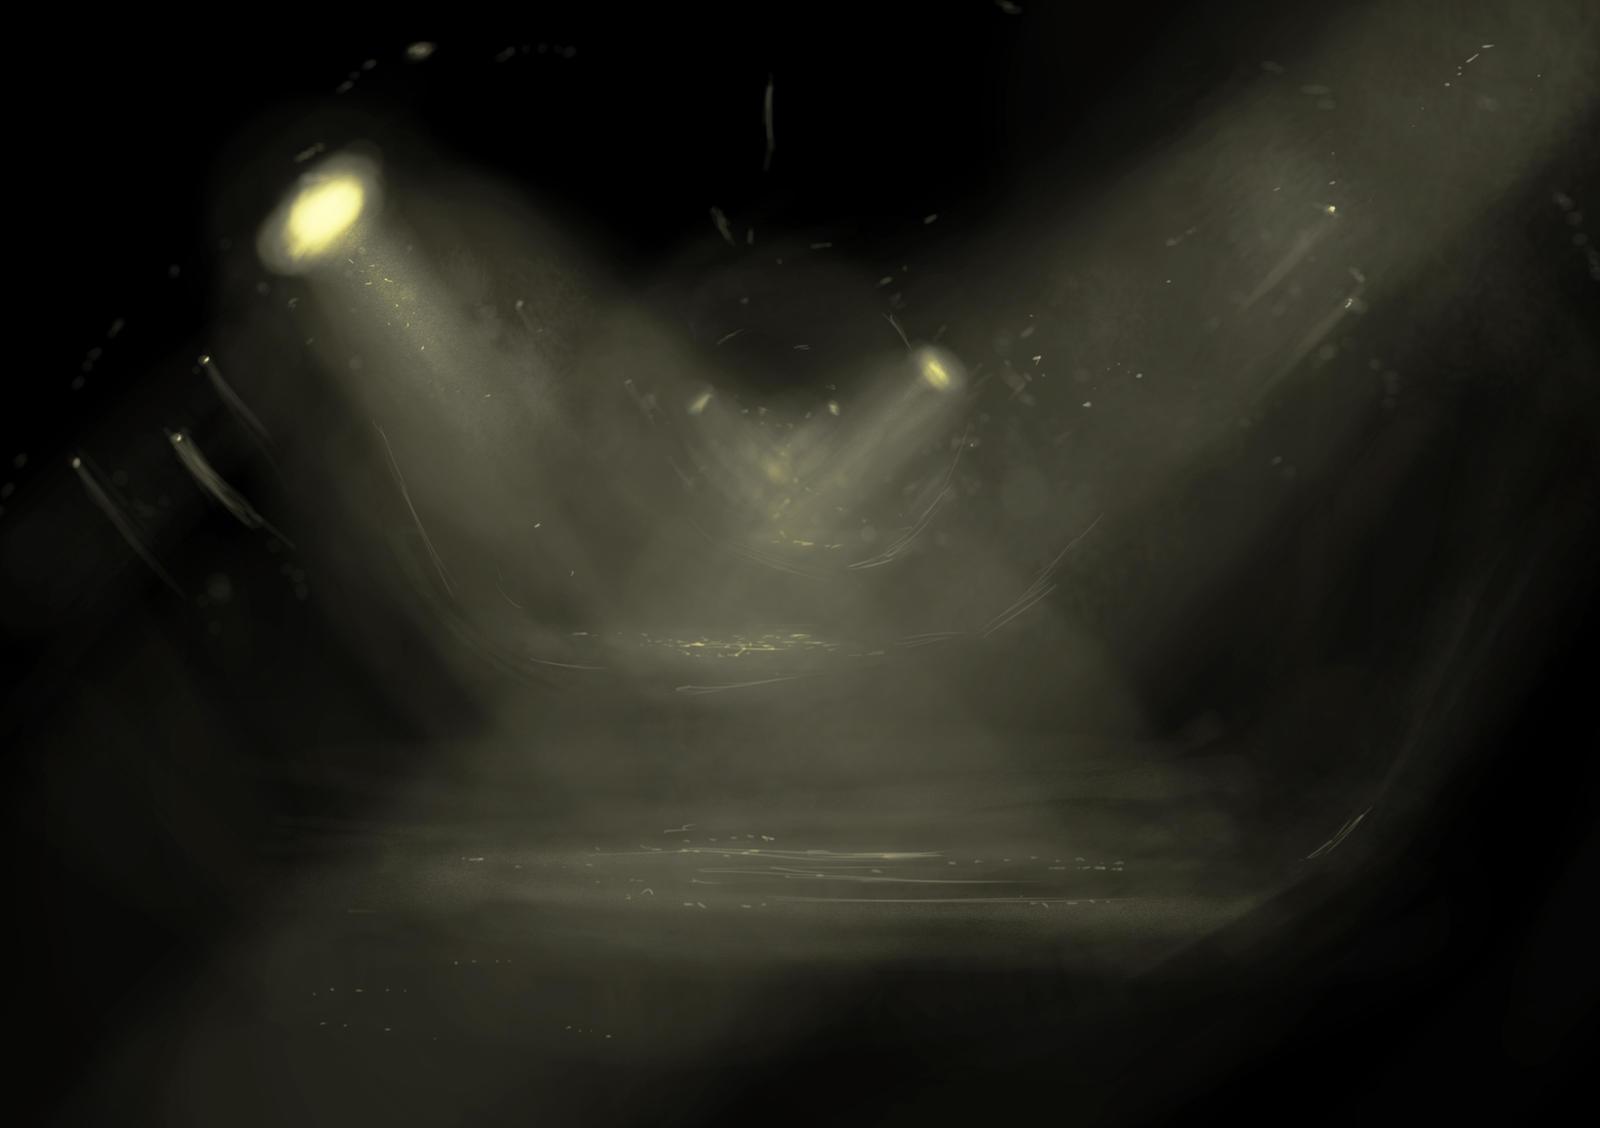 Musicscape1 by ThemeFinland